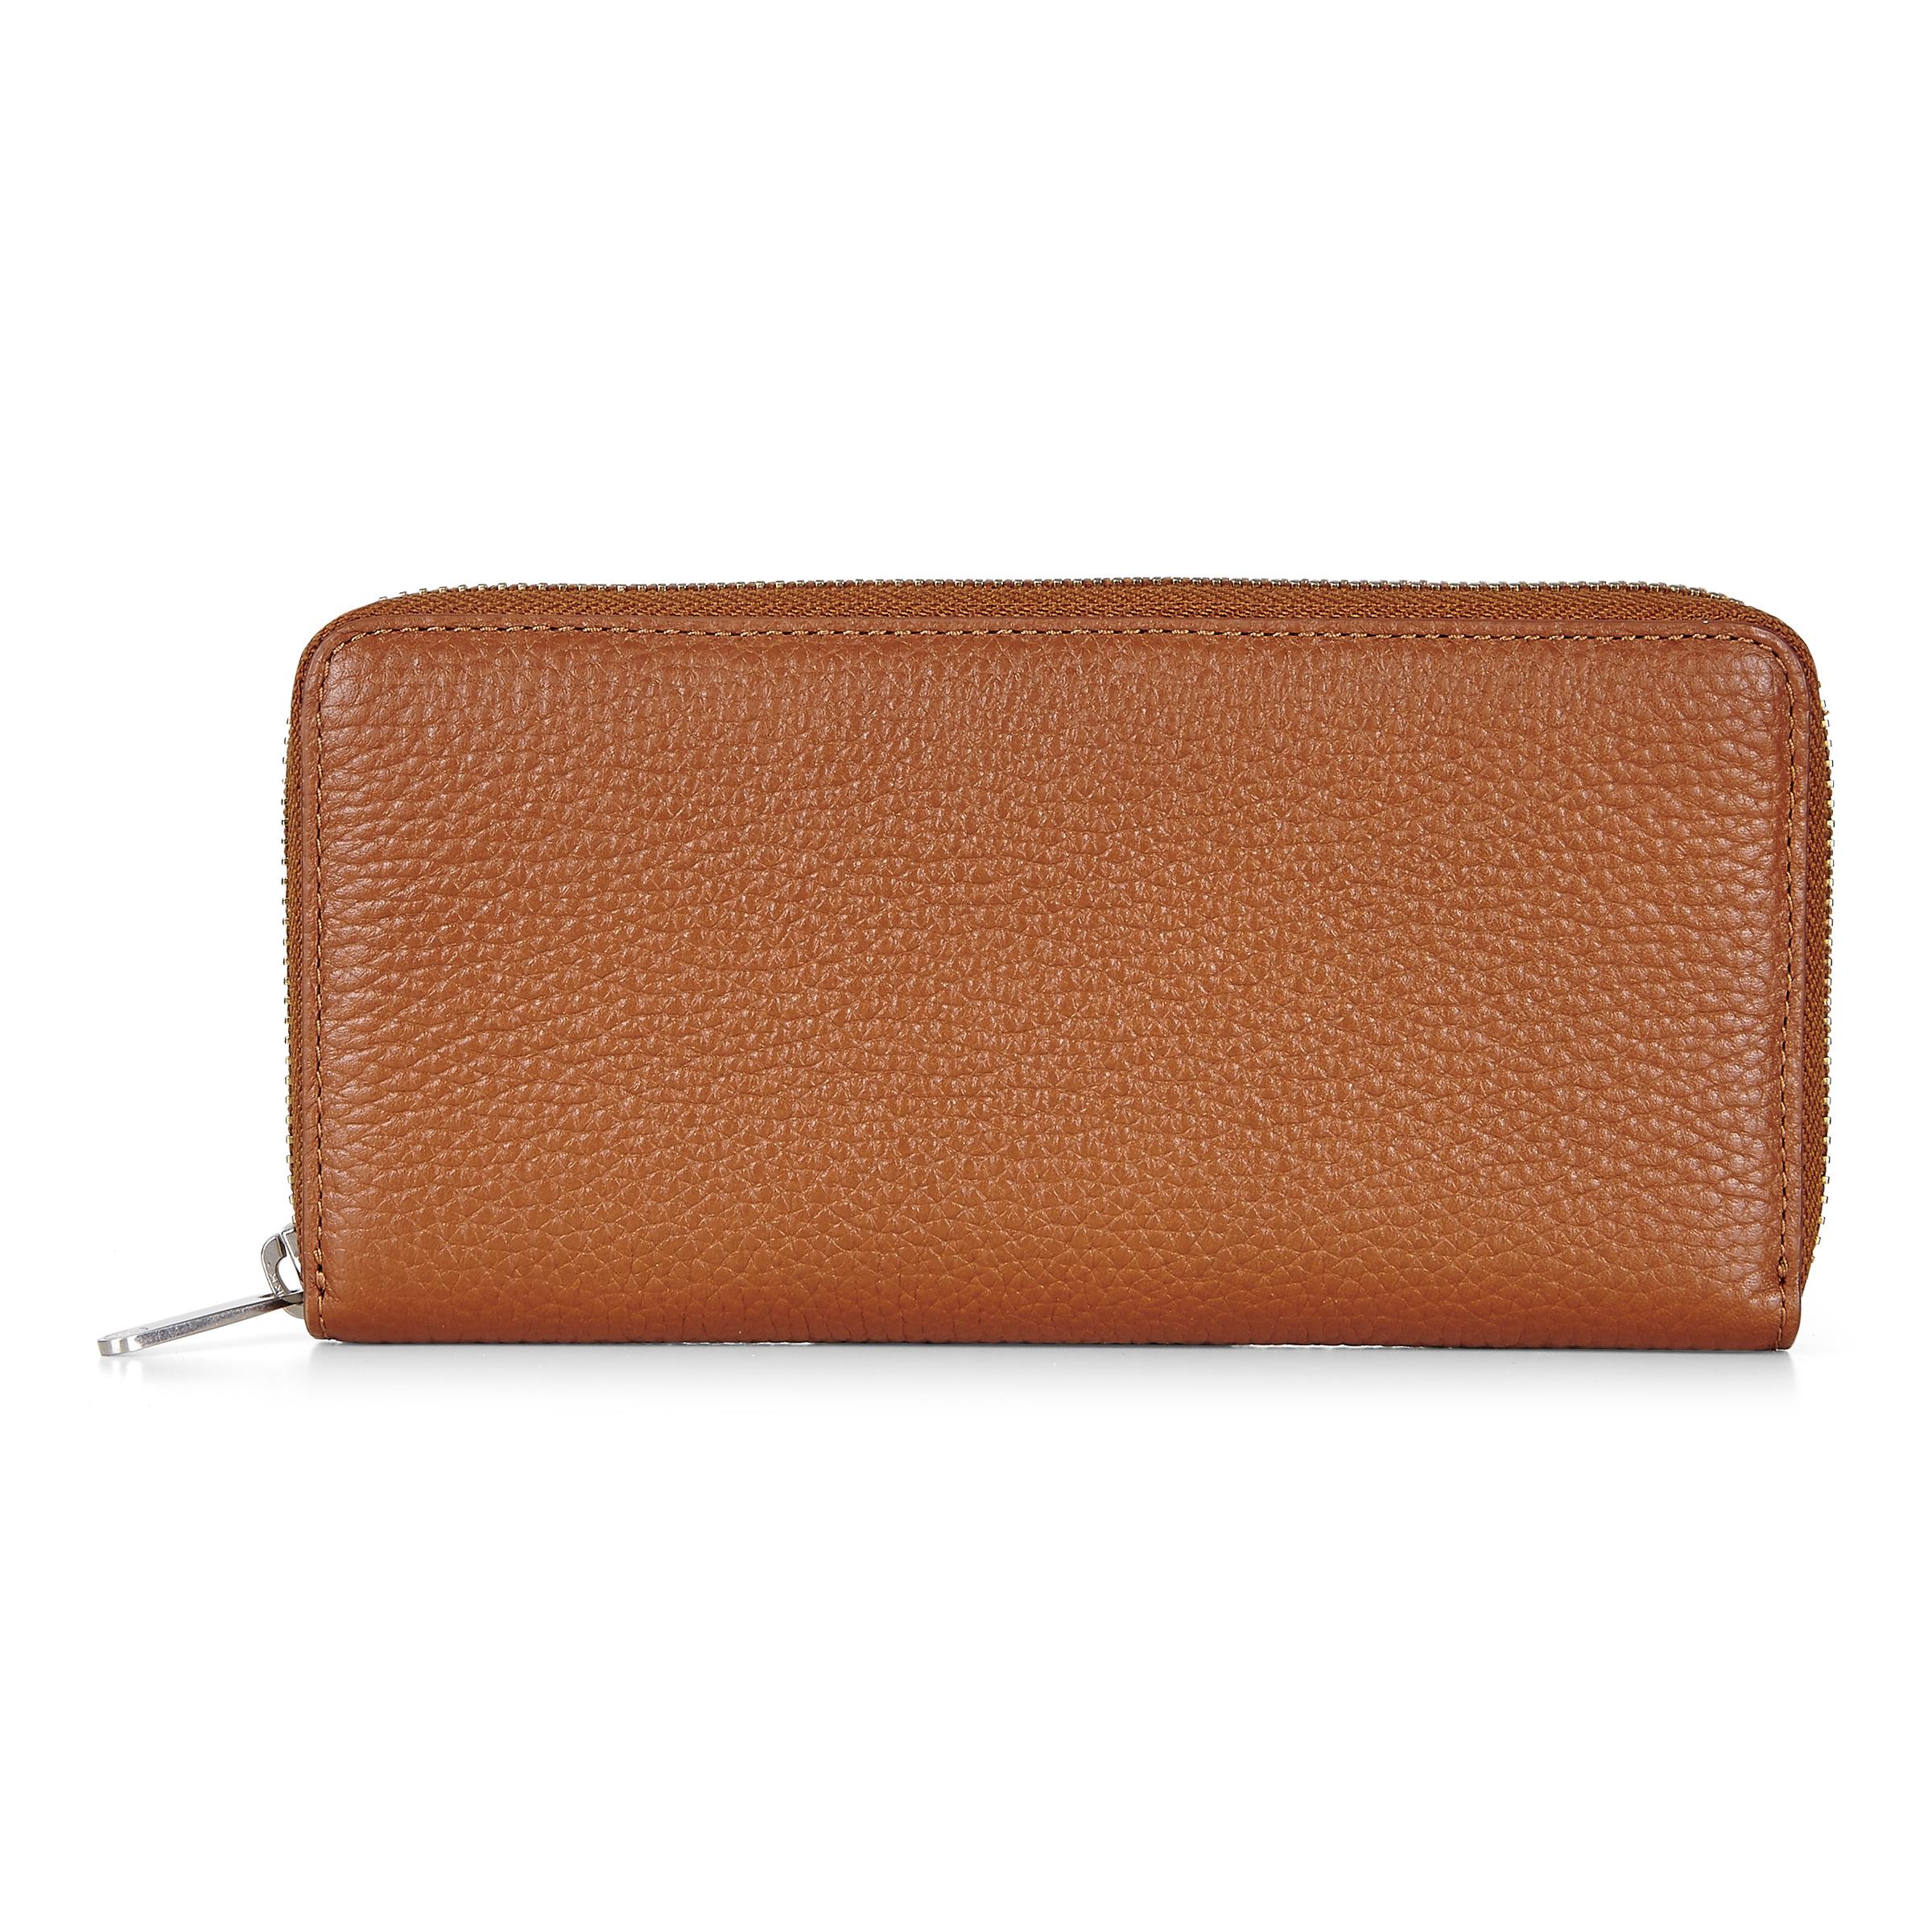 Image of ECCO Isan 2 Large Zip Wallet